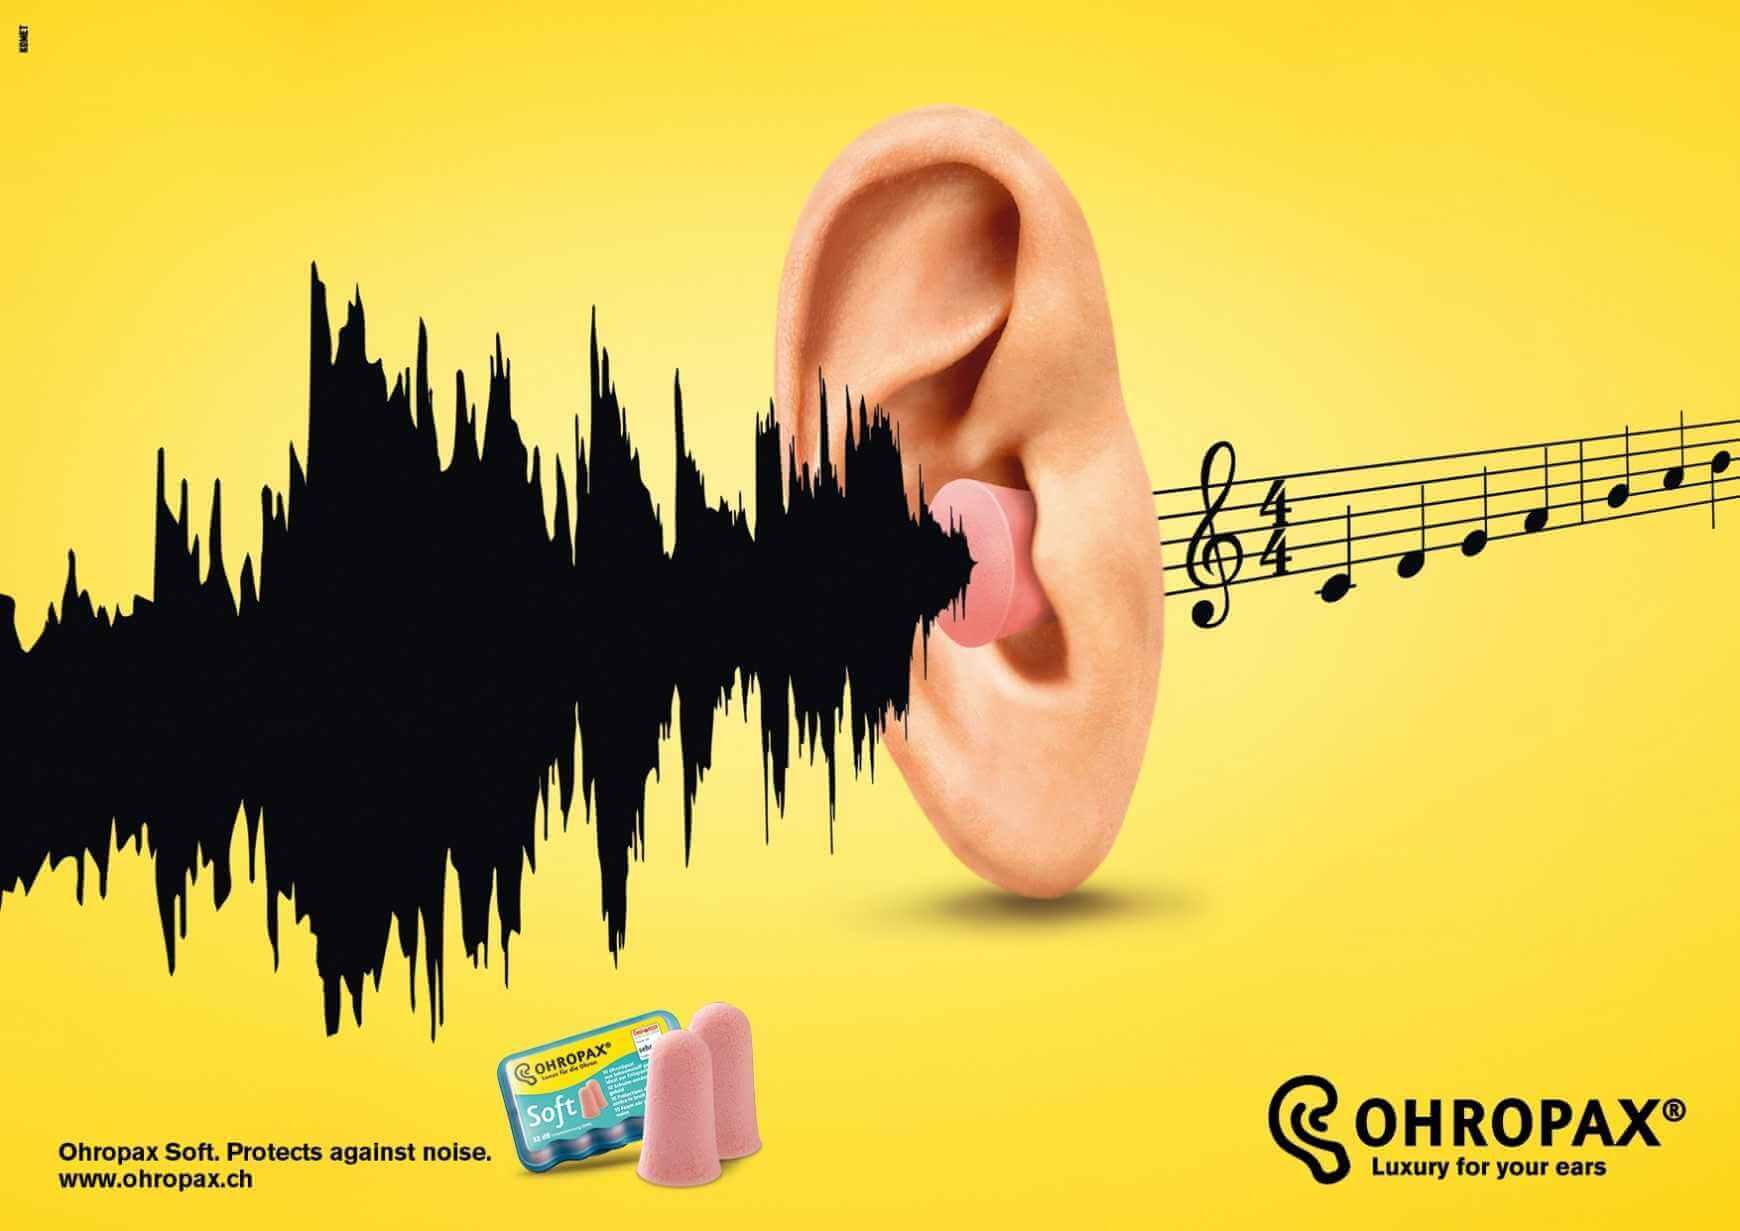 Ohropax: Protección para tus oídos.